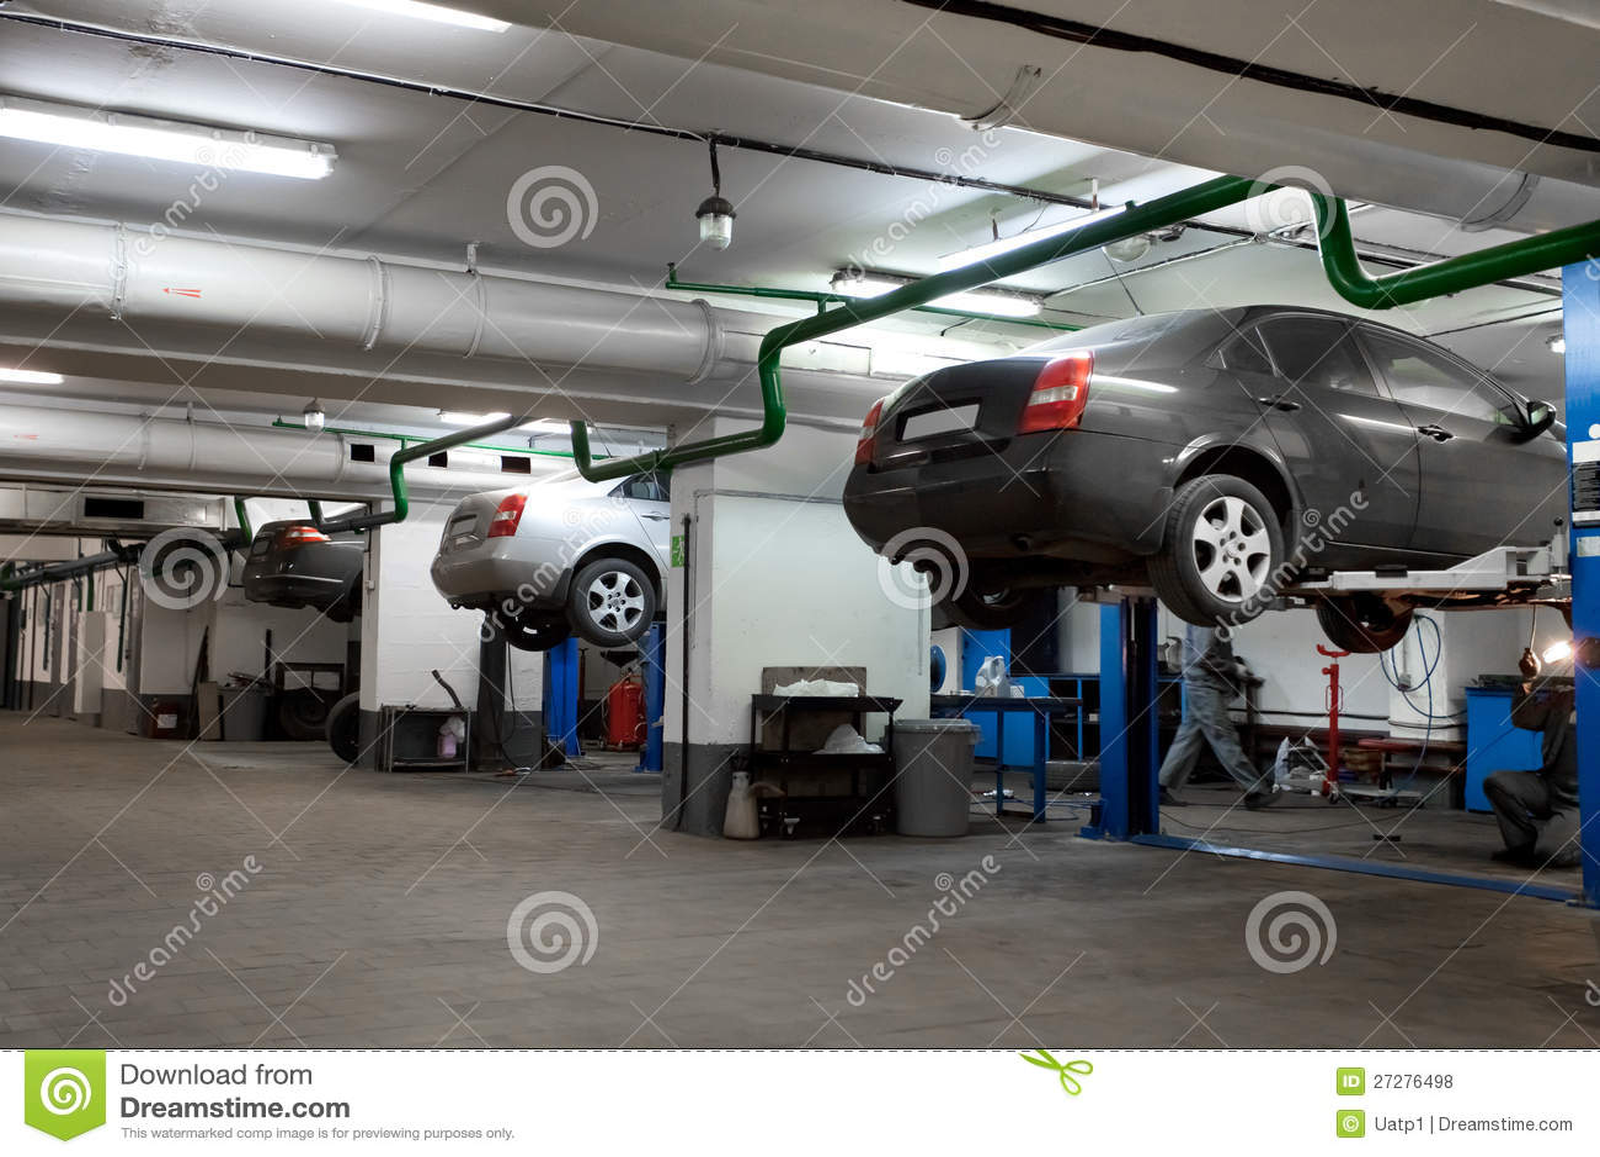 Repair garage royalty free stock photos image 27276498 for Garage reparation sarcelles